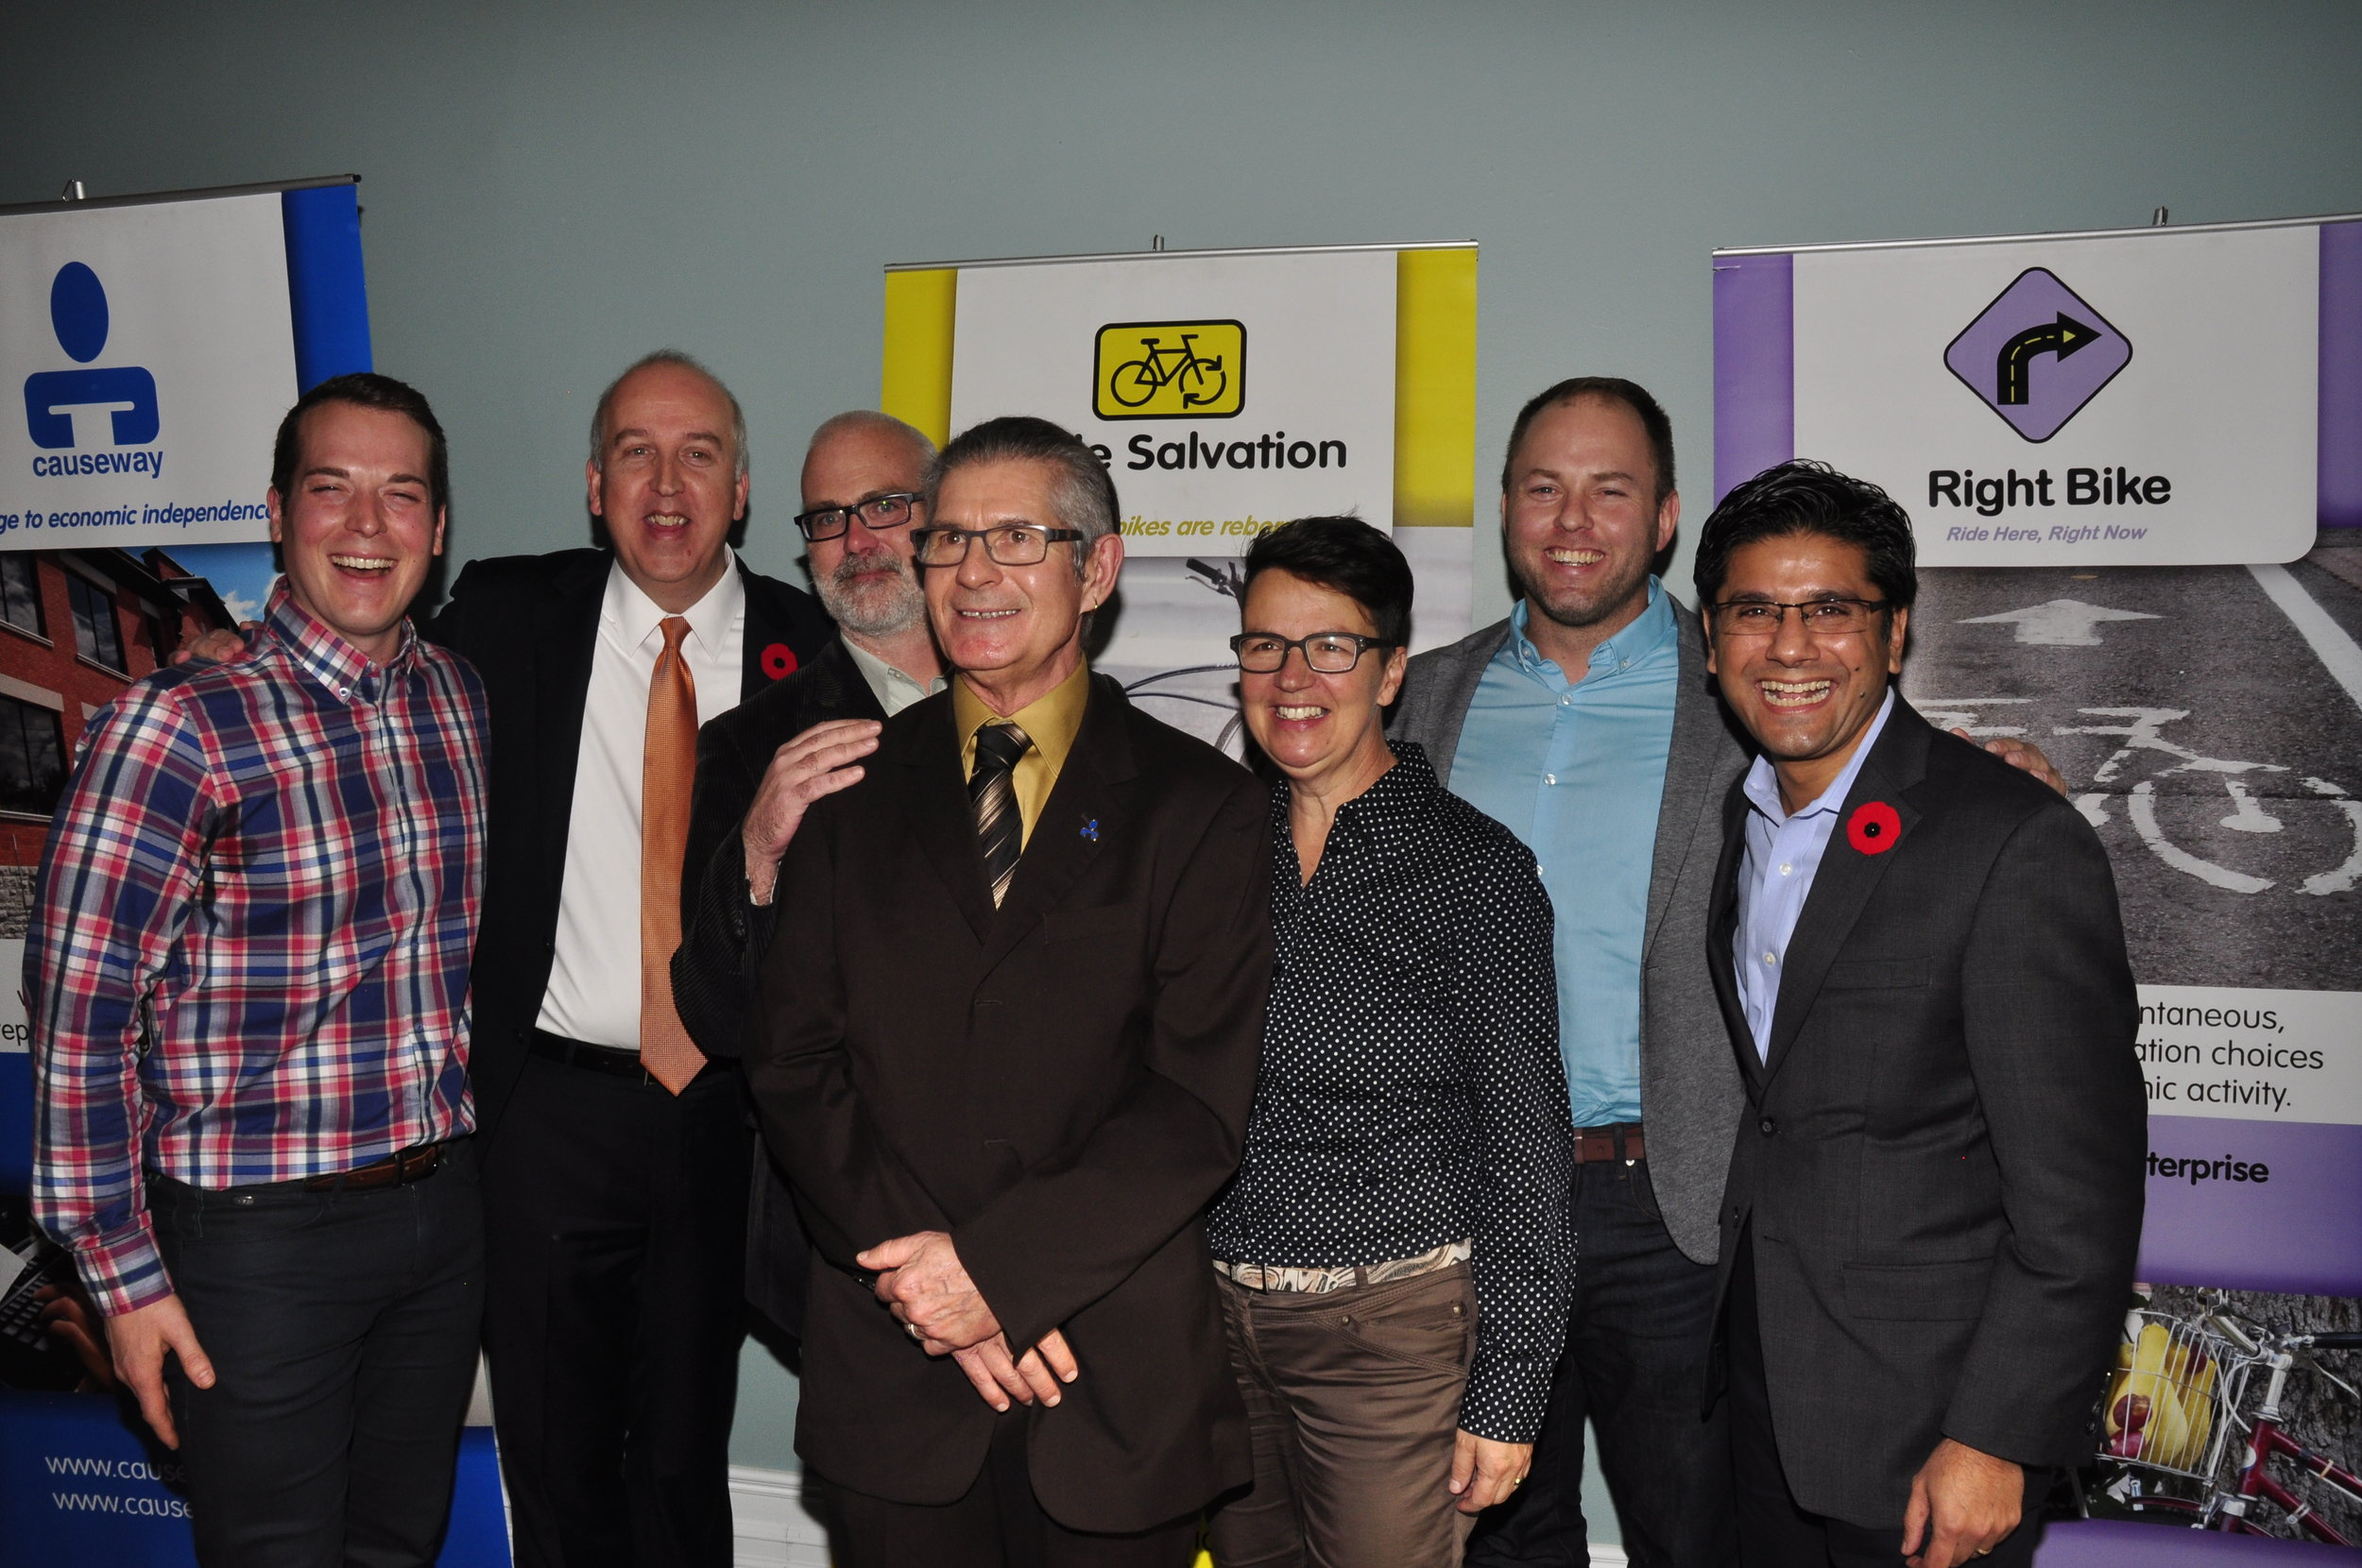 (Left to Right) Mathieu Fleury, Rob Paterson, Jeff Leiper, Don Palmer, Catherine McKenney, Doug Pawson, Hon. Yasir Naqvi